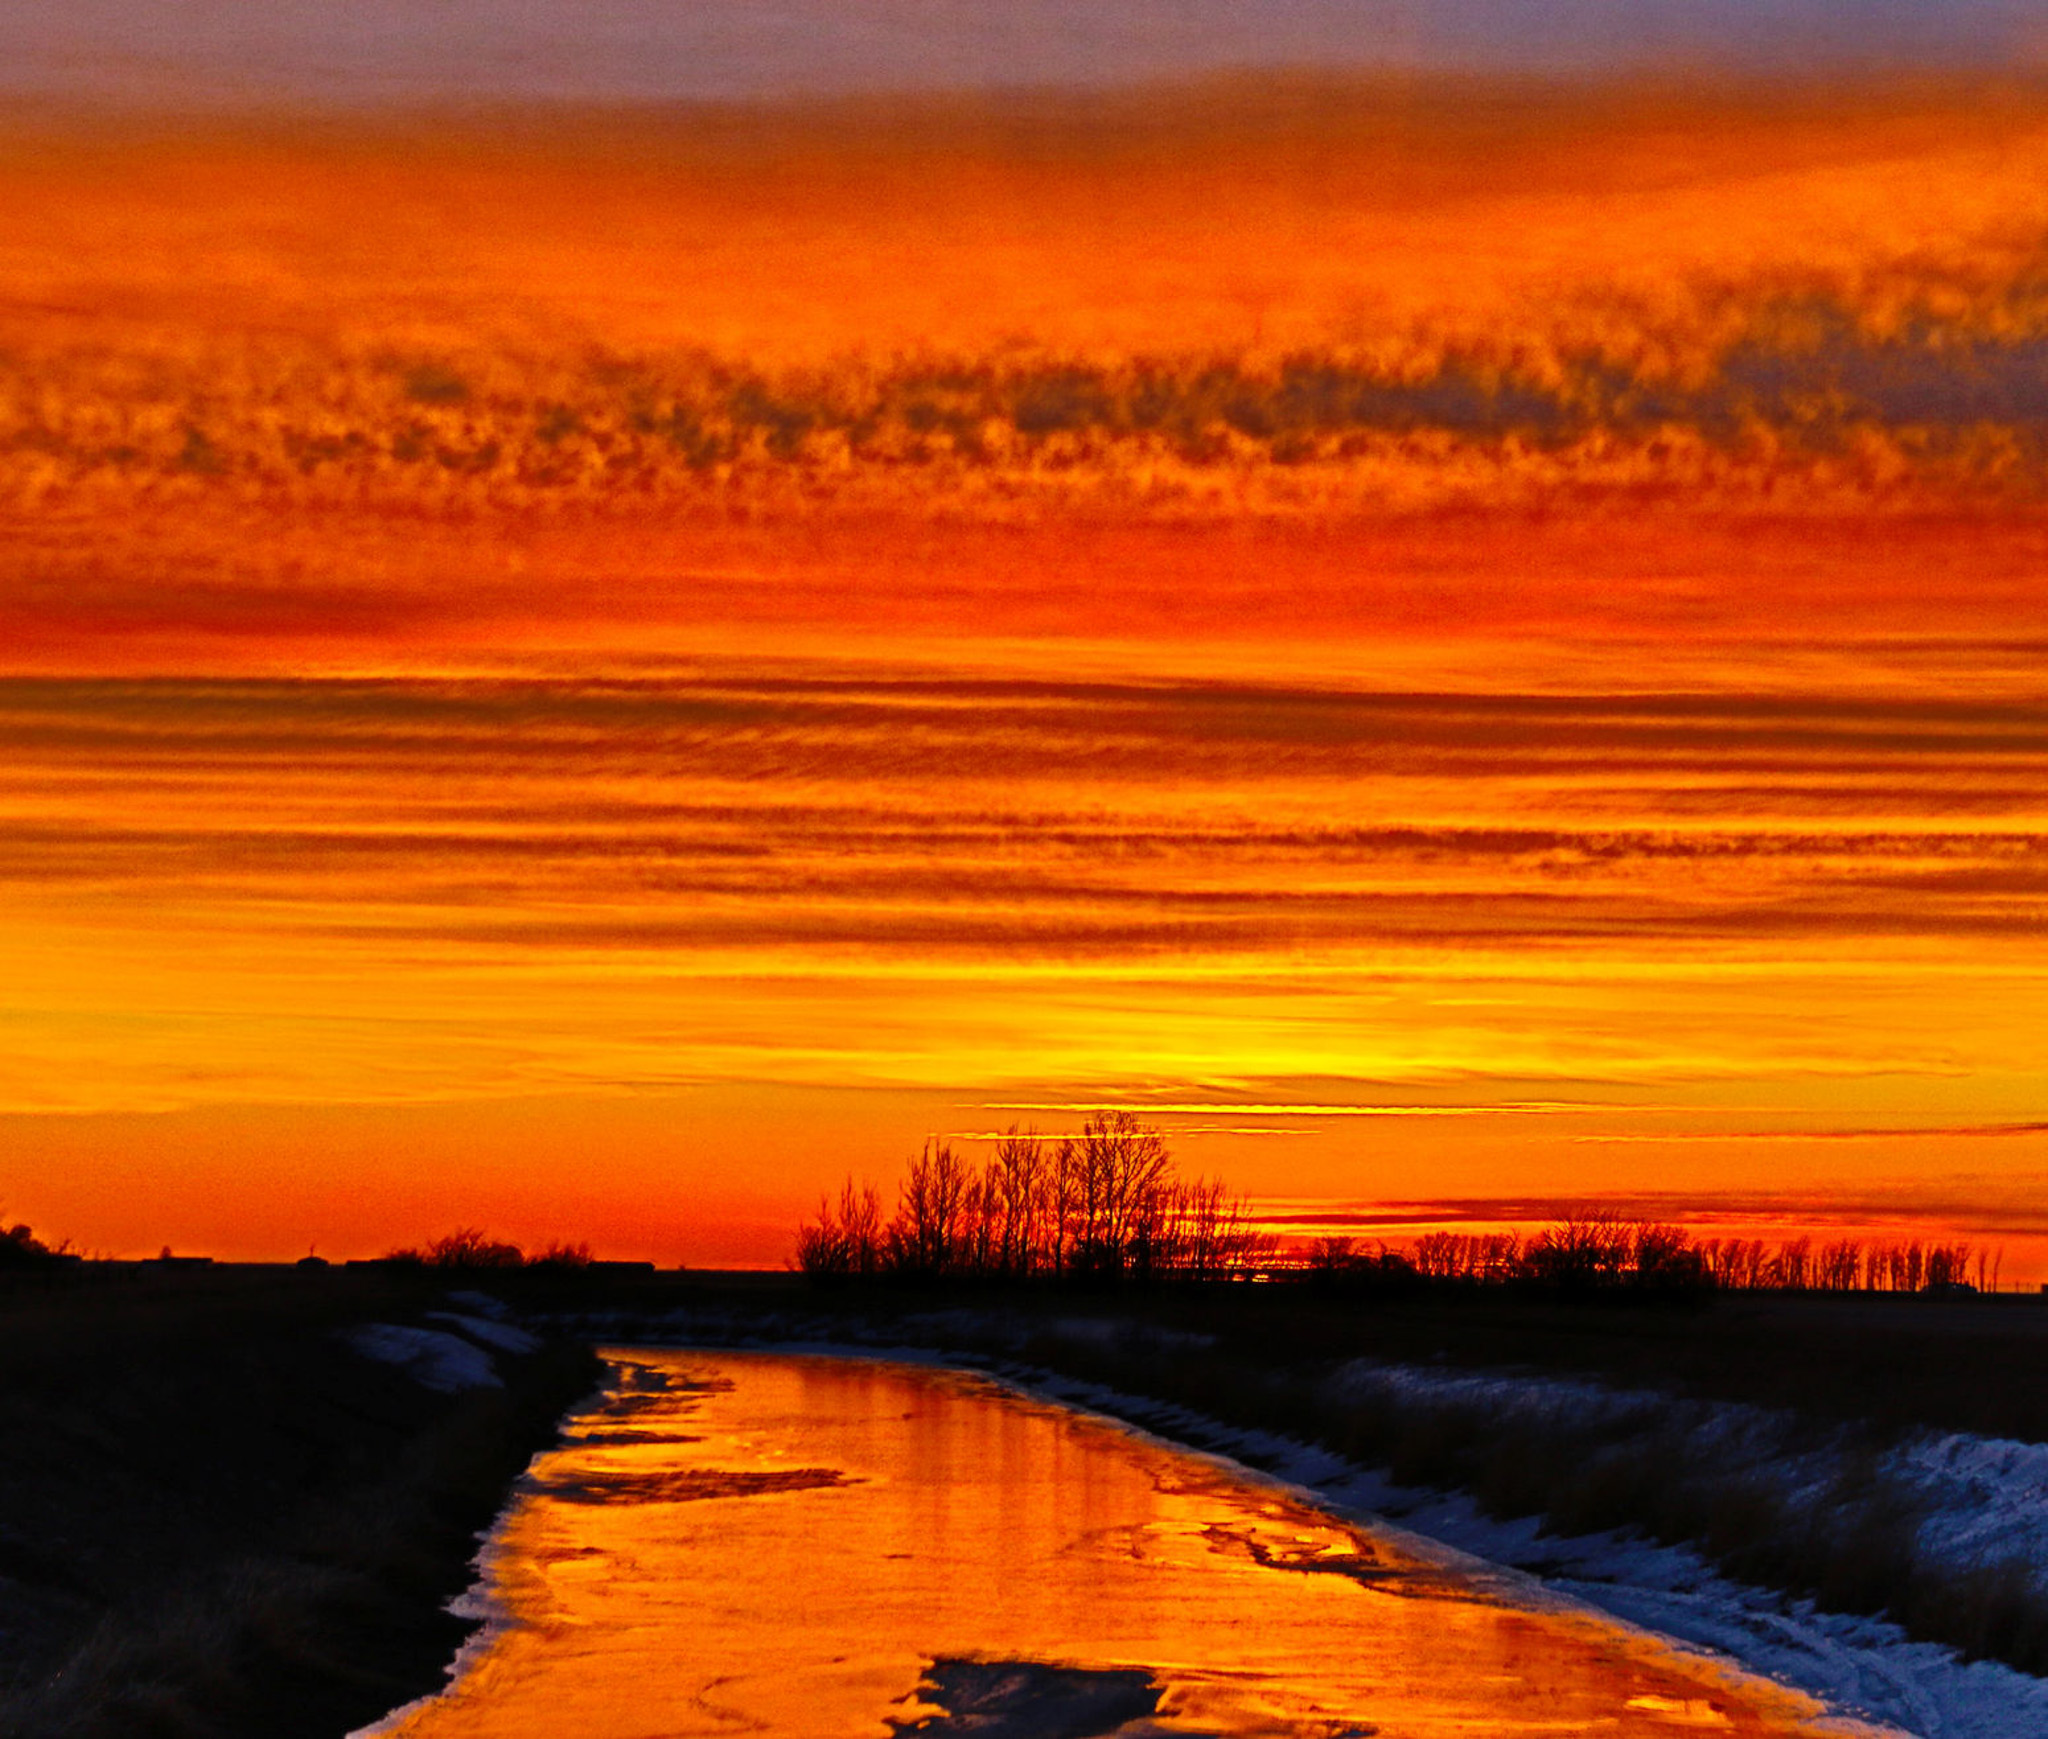 Canal Sunrise - Doug Boyce